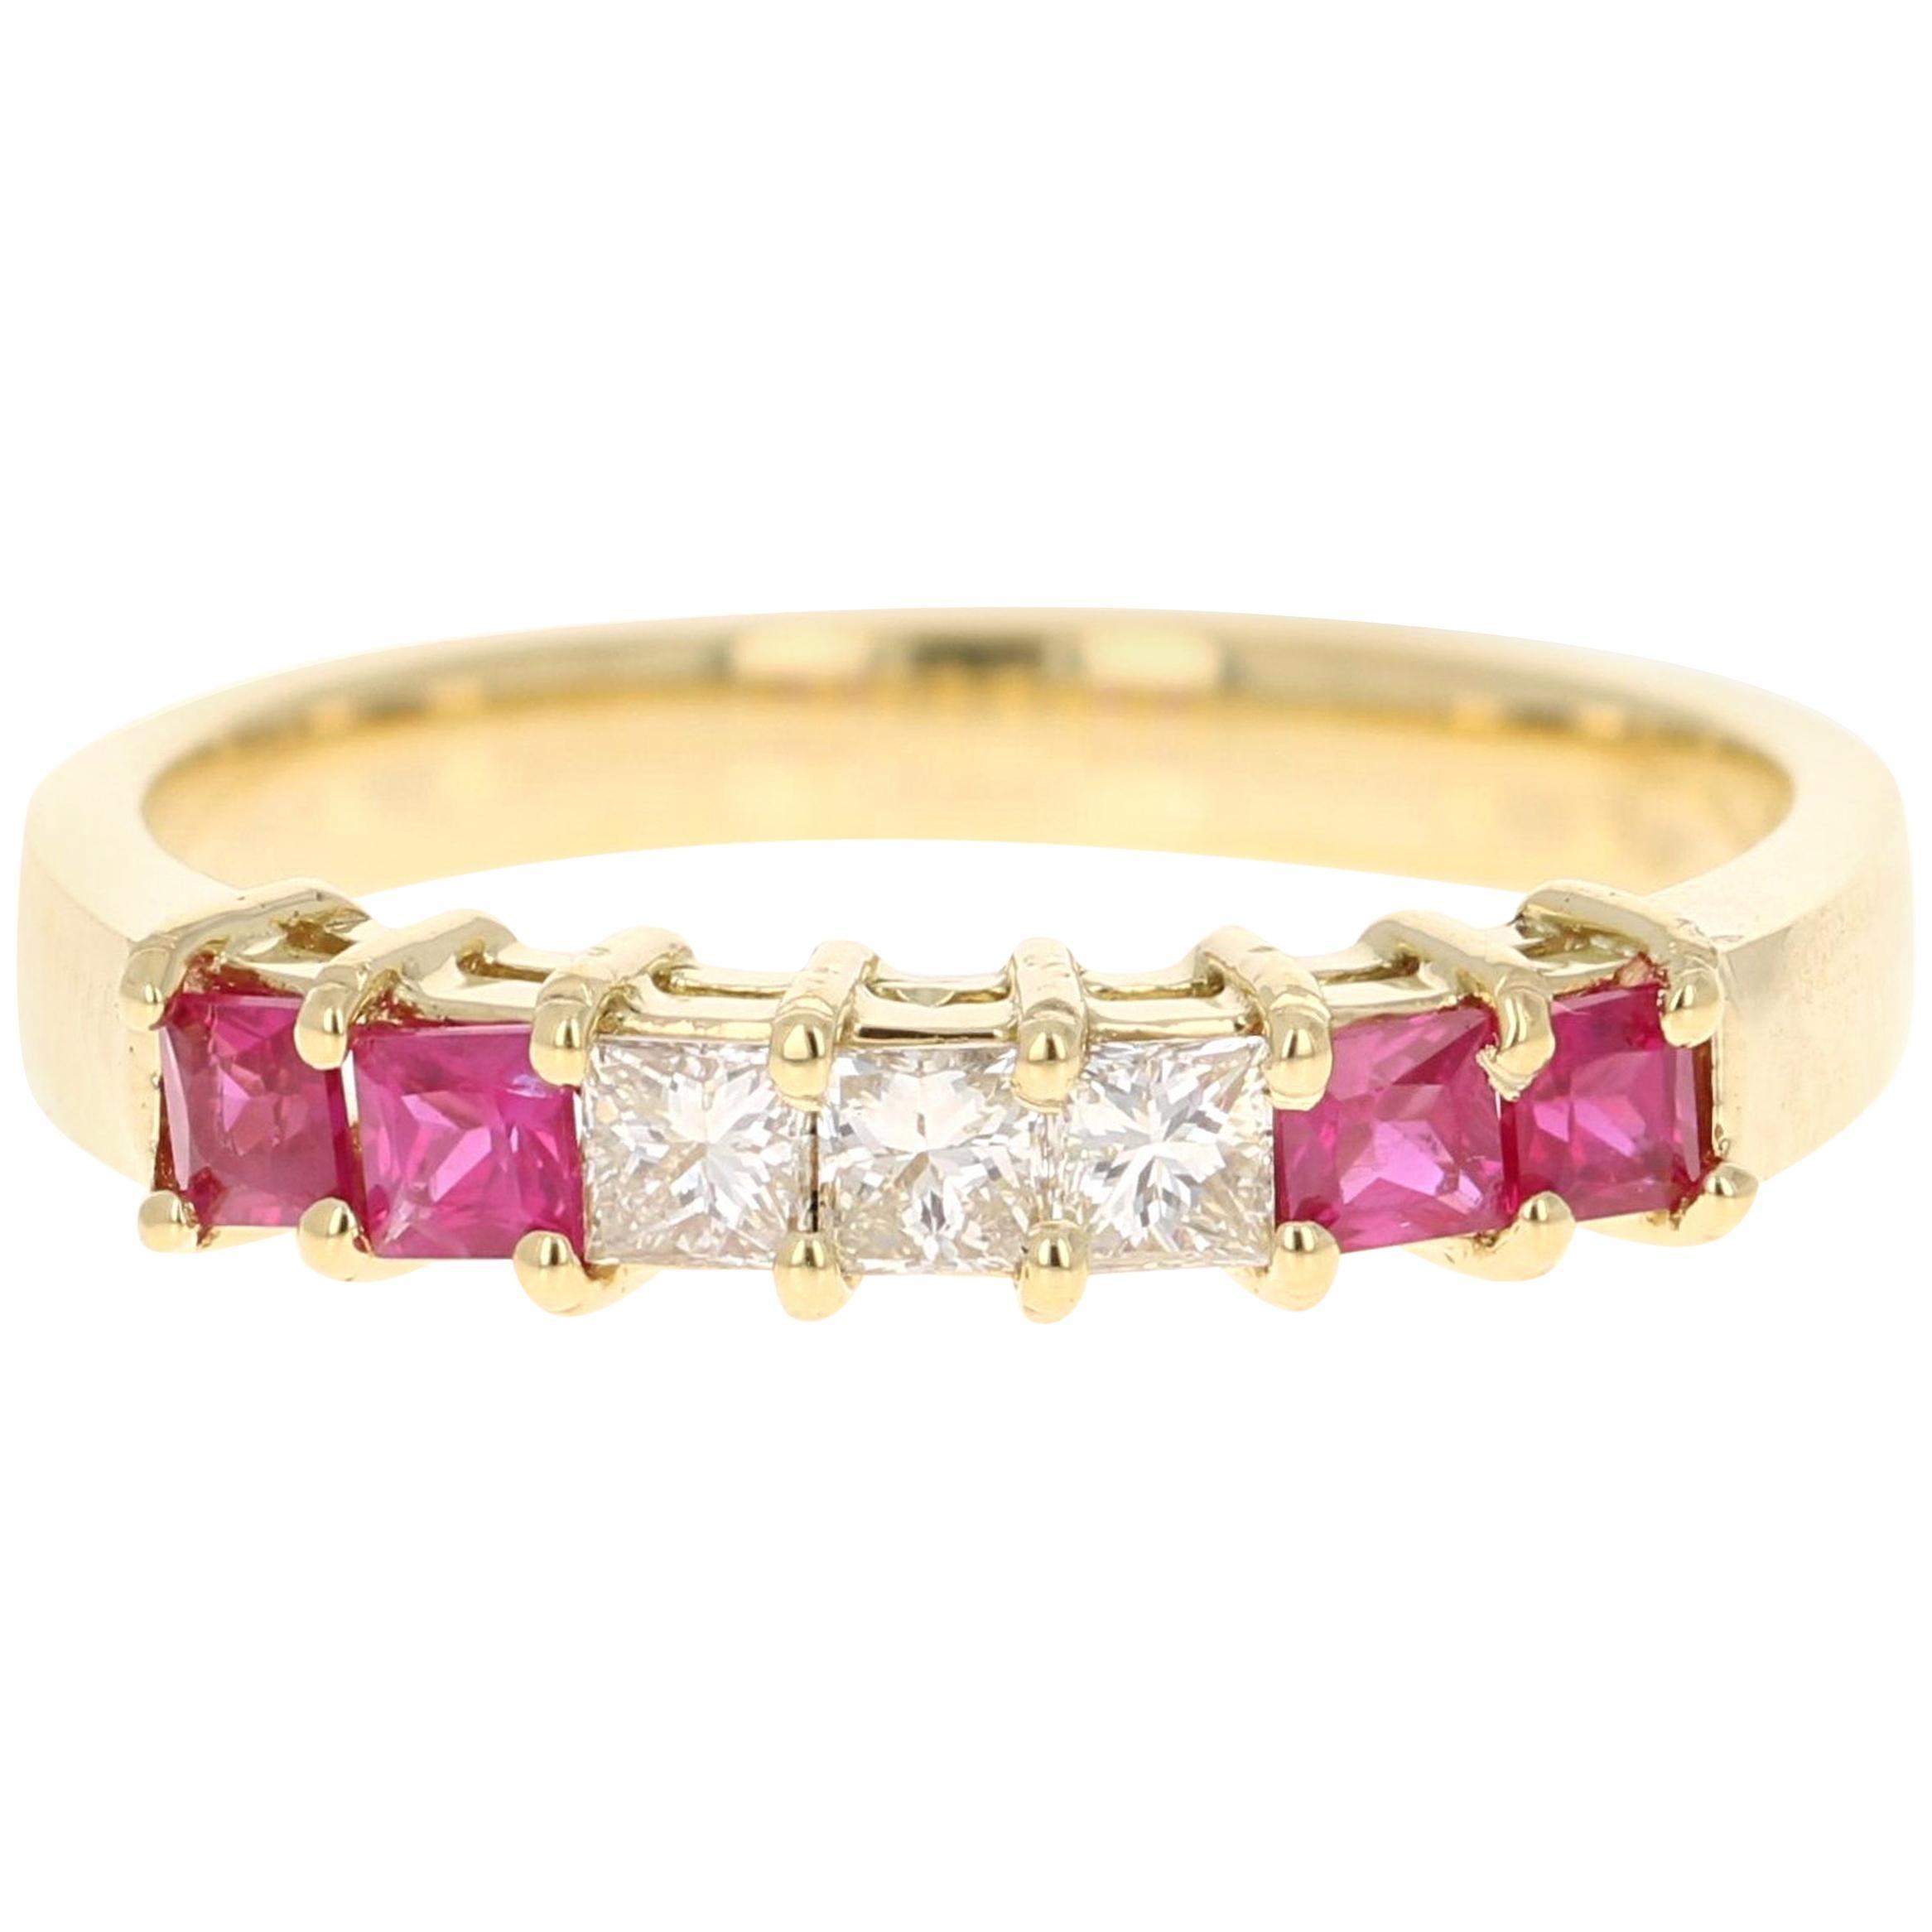 0.67 Carat Ruby Diamond 18 Karat Yellow Gold Band